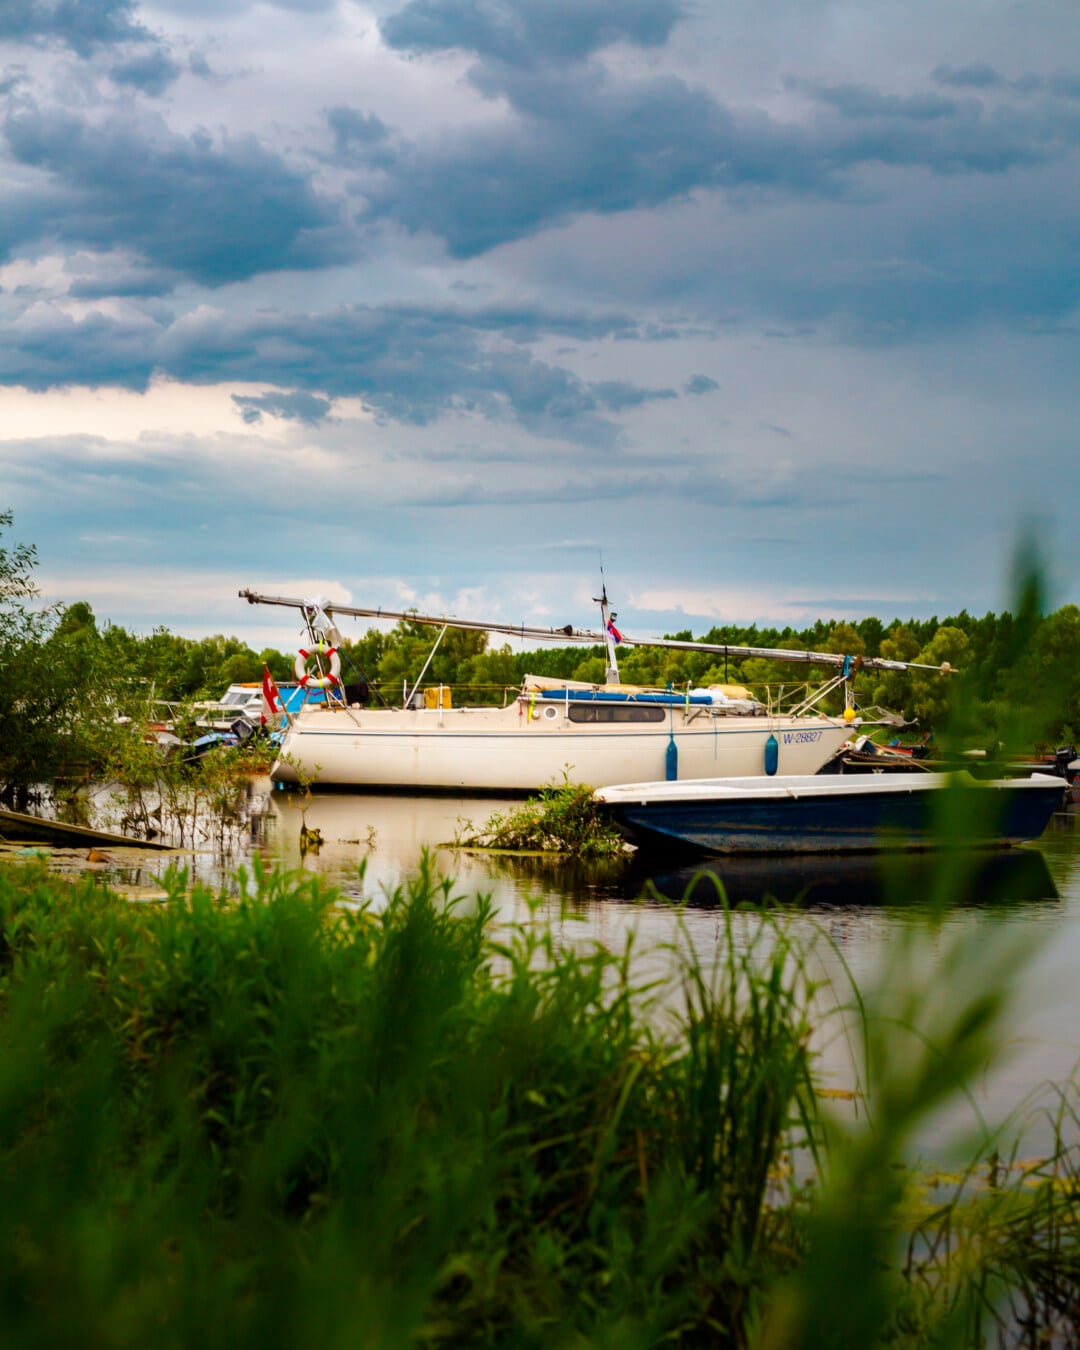 Segeln, Segelboot, Hafen, Marina, Boot, Wasser, Sommer, Seebrücke, Natur, Seashore